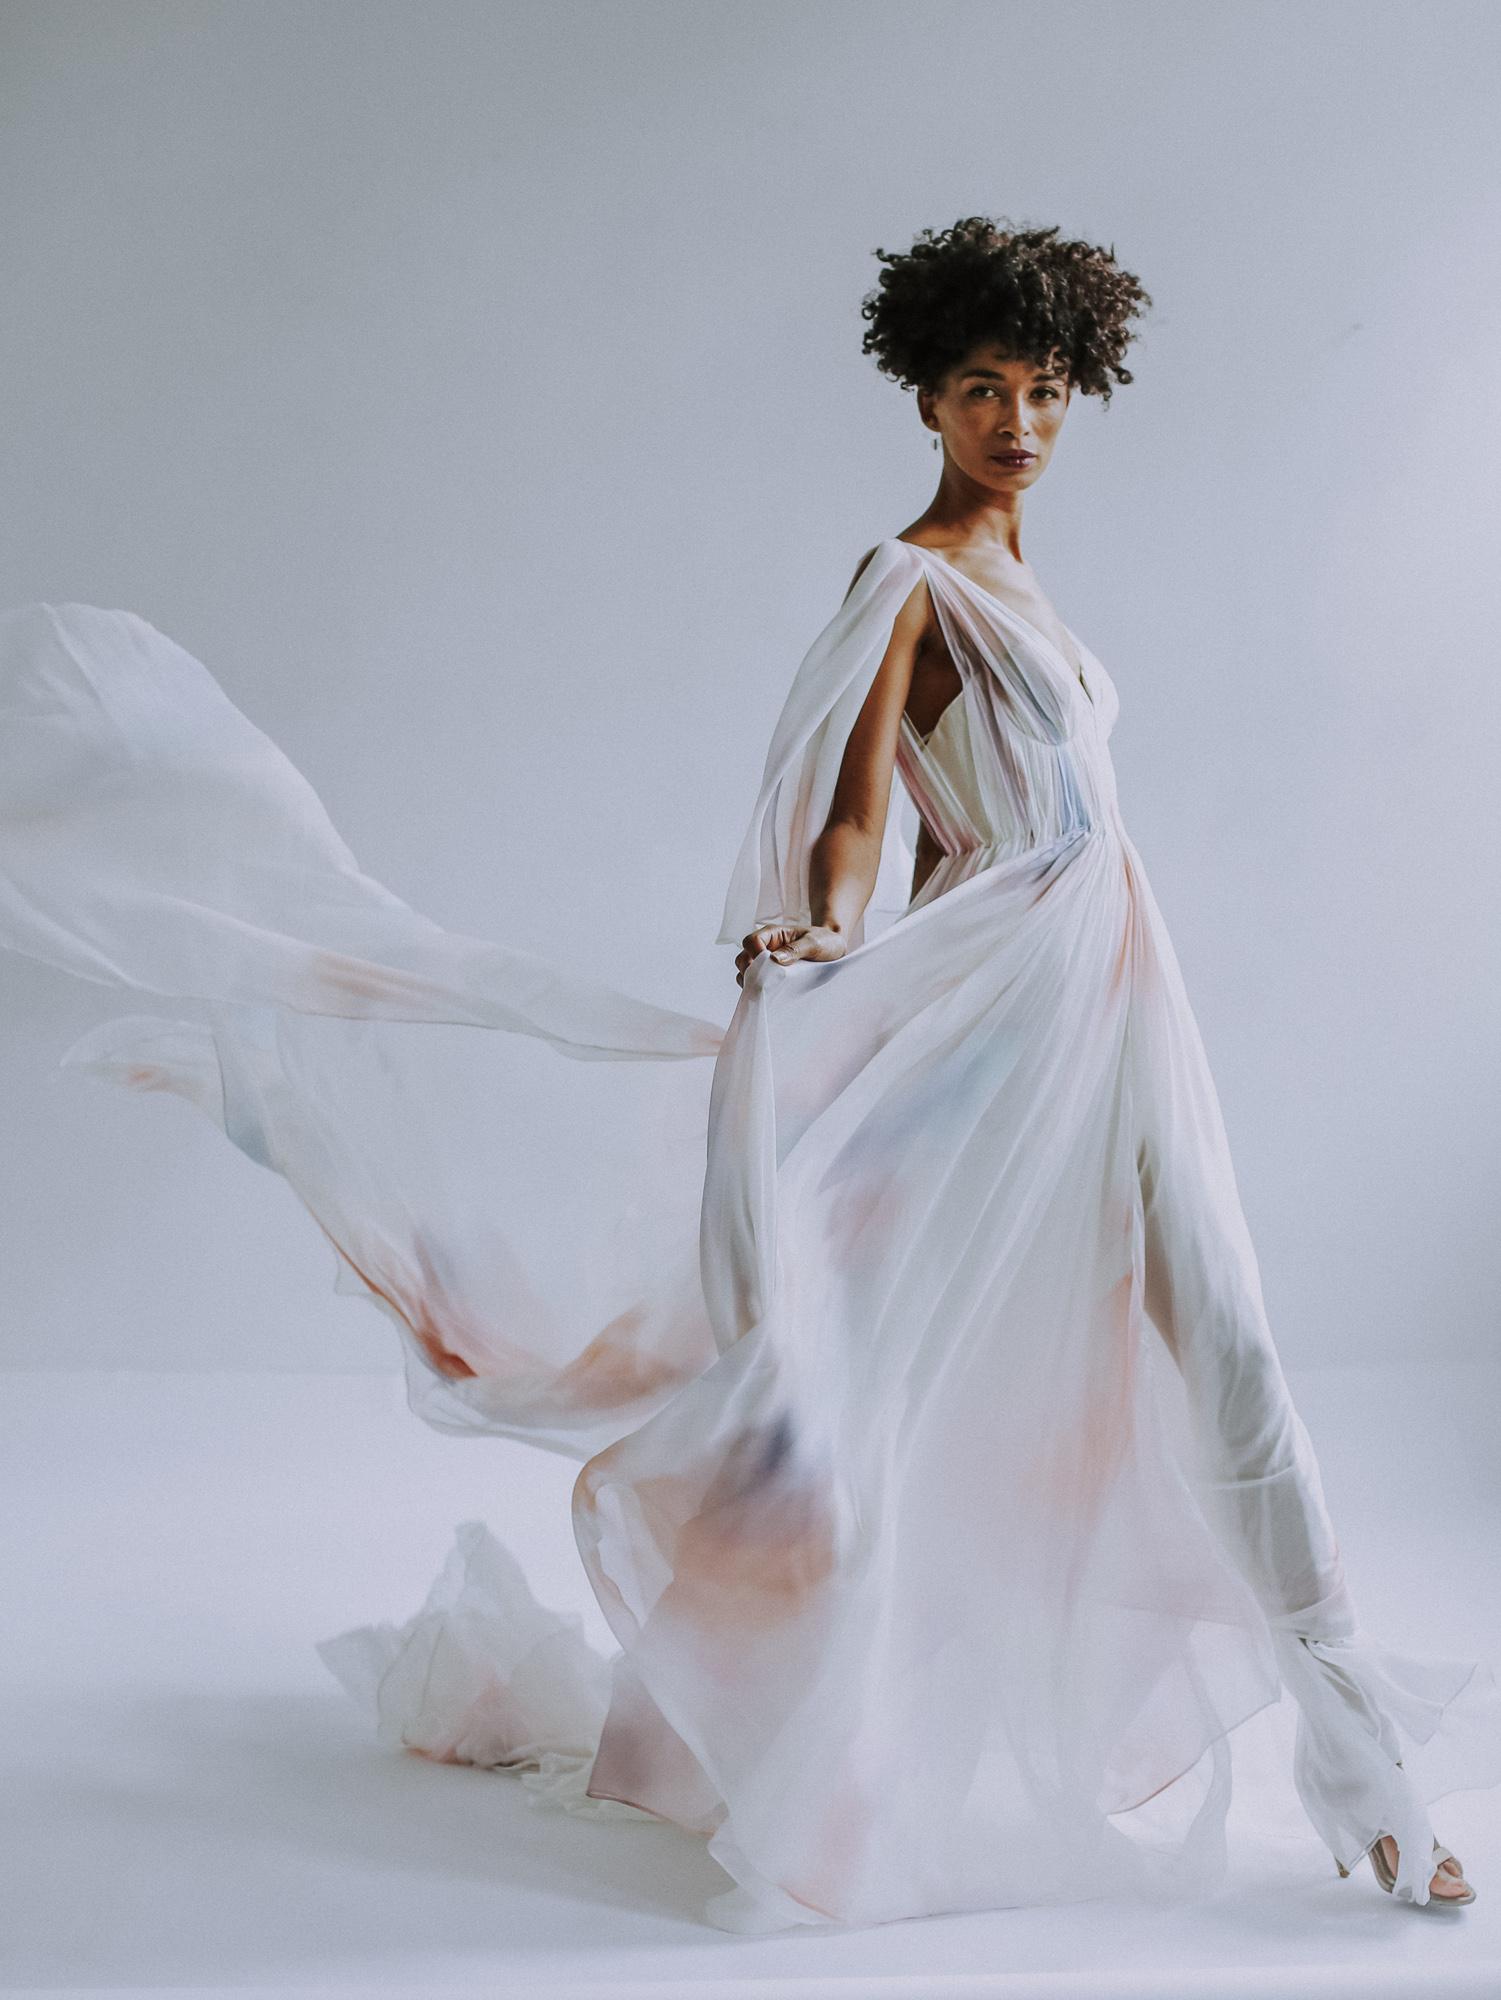 leanne-marshall-wedding-gown-14.jpg